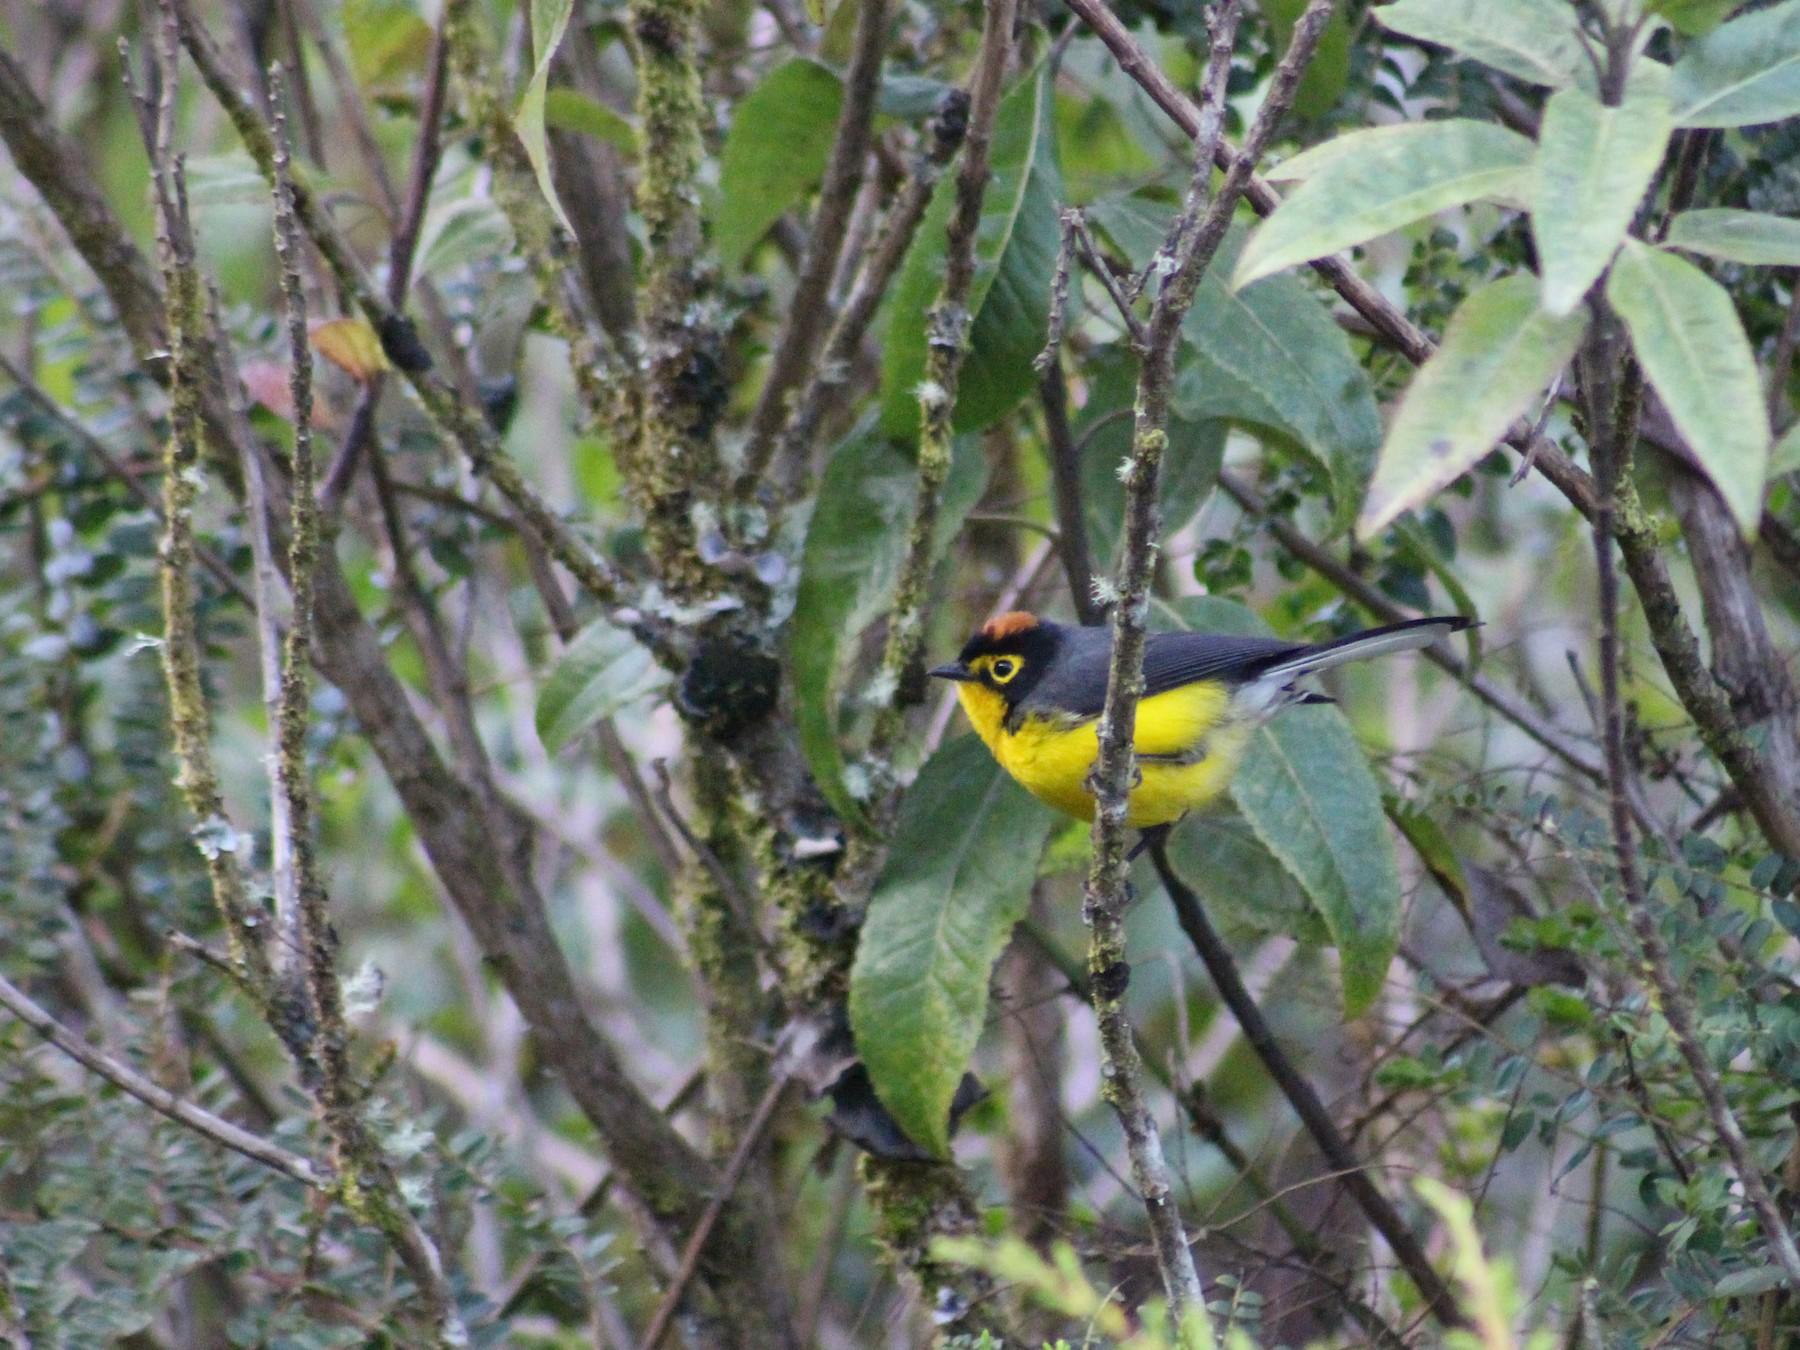 Spectacled Redstart - Ty Sharrow